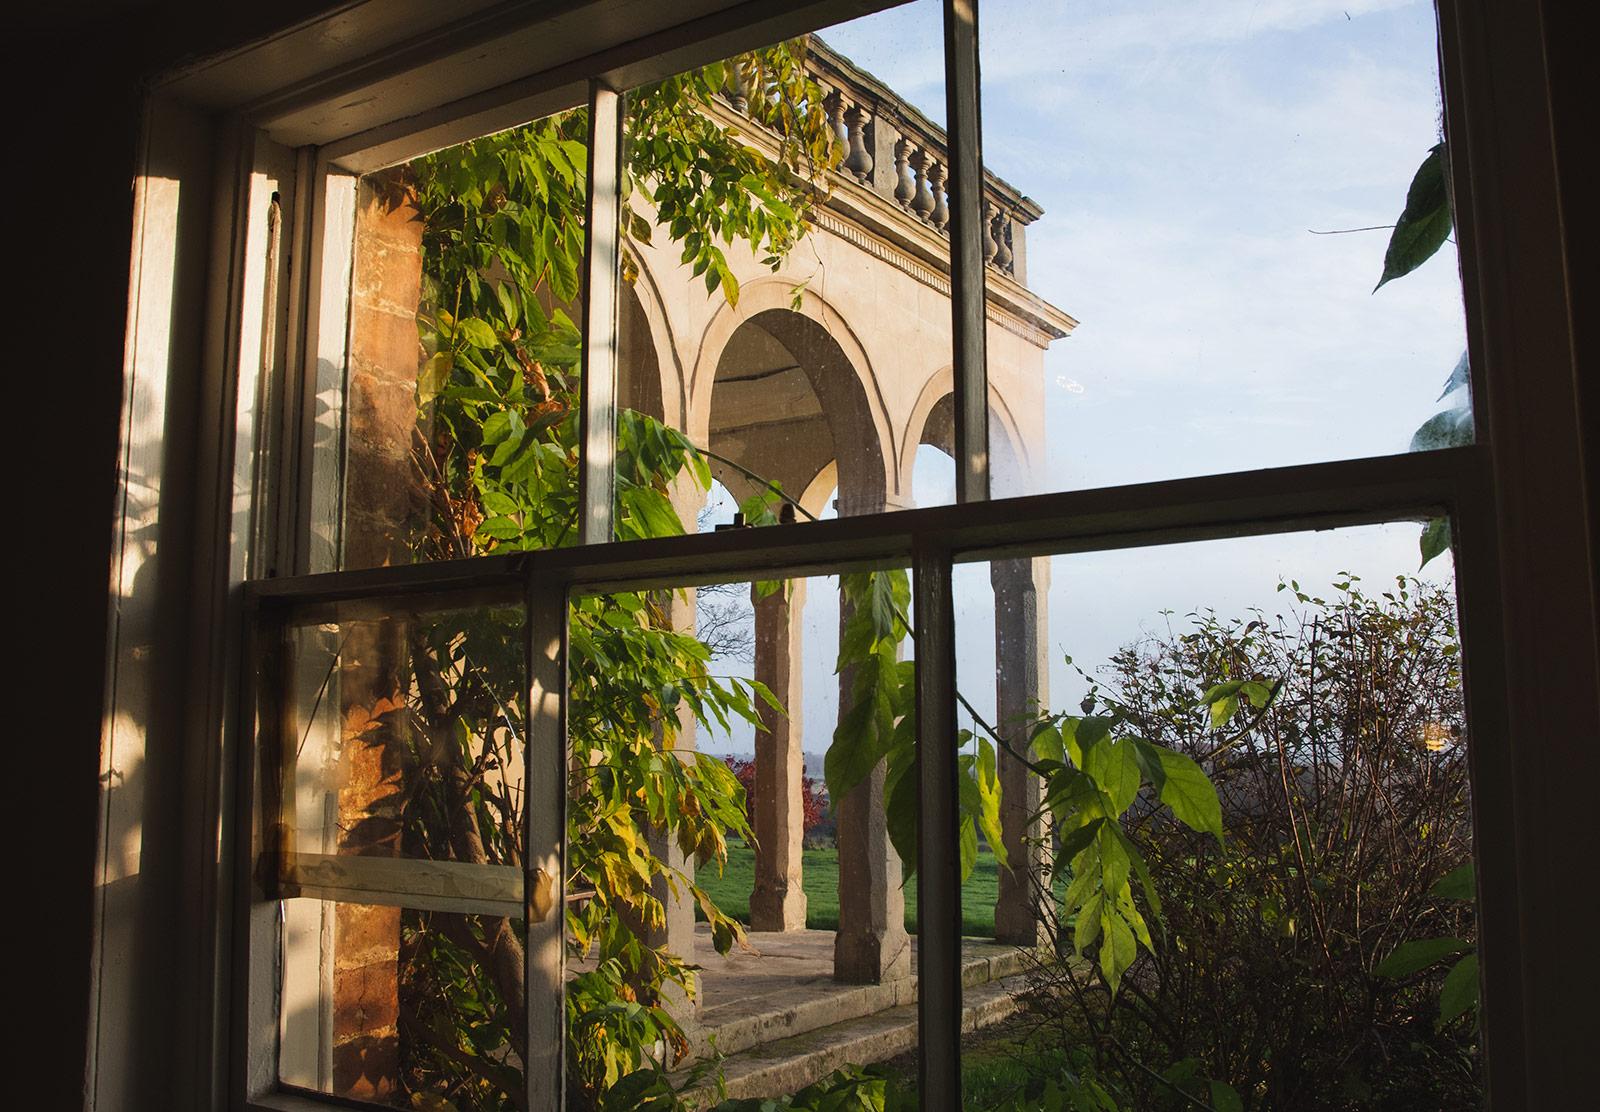 Building pillars through window